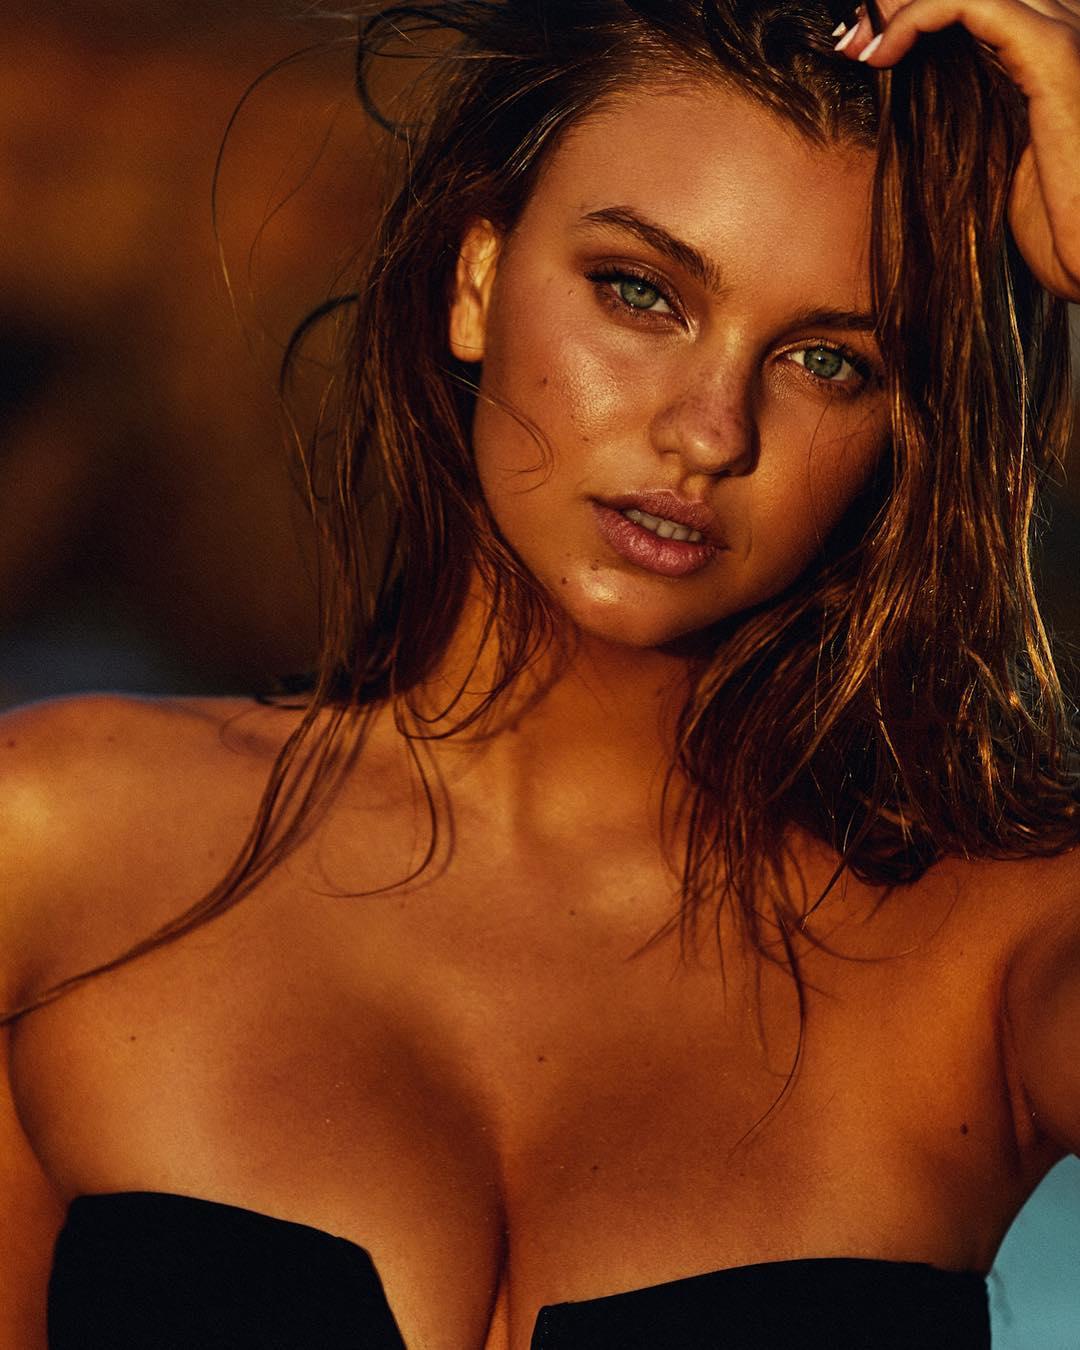 Erotica Olivia Brower naked (28 photo), Ass, Paparazzi, Boobs, underwear 2020